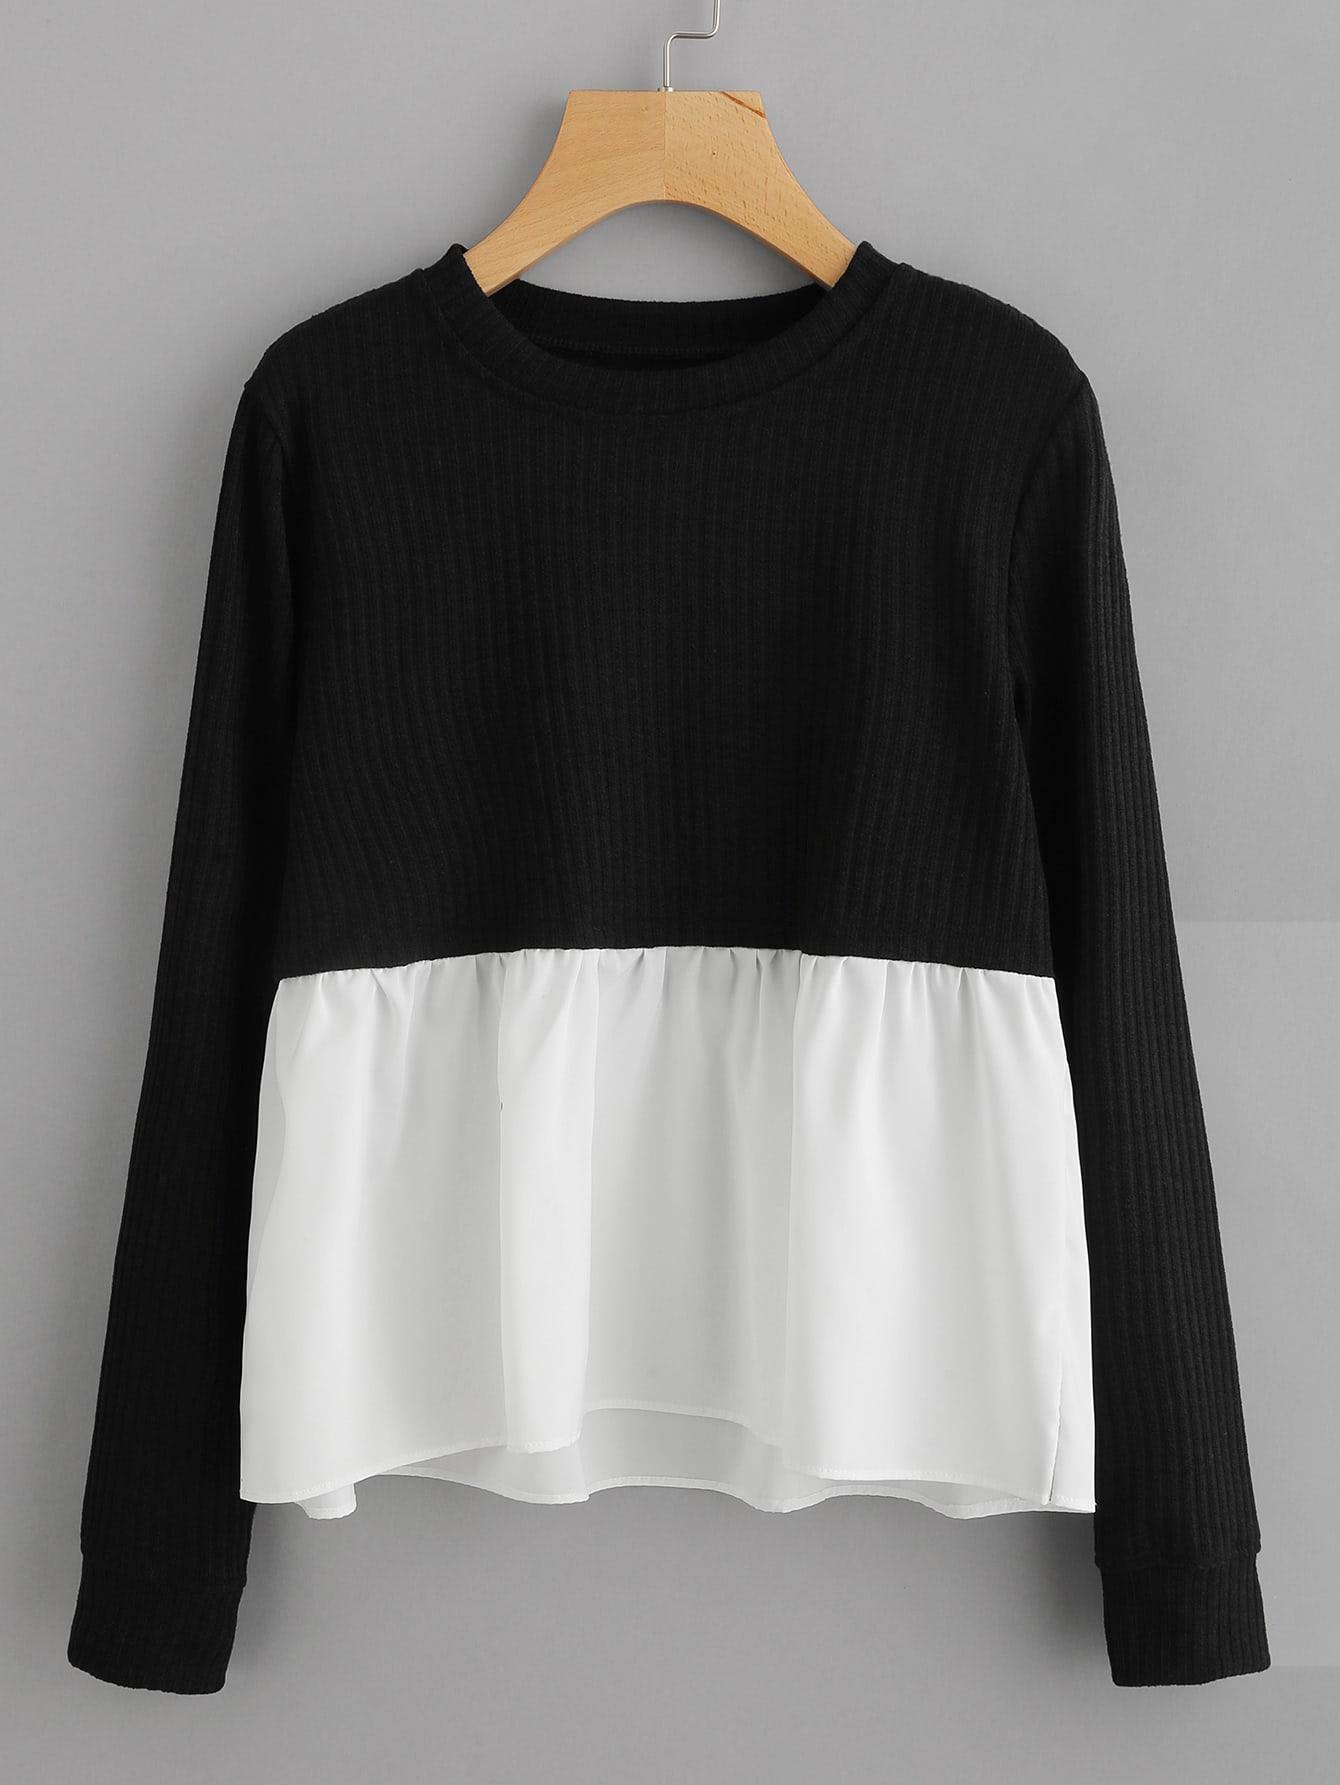 Contrast Frill Hem Ribbed Sweatshirt sweatshirt170922115